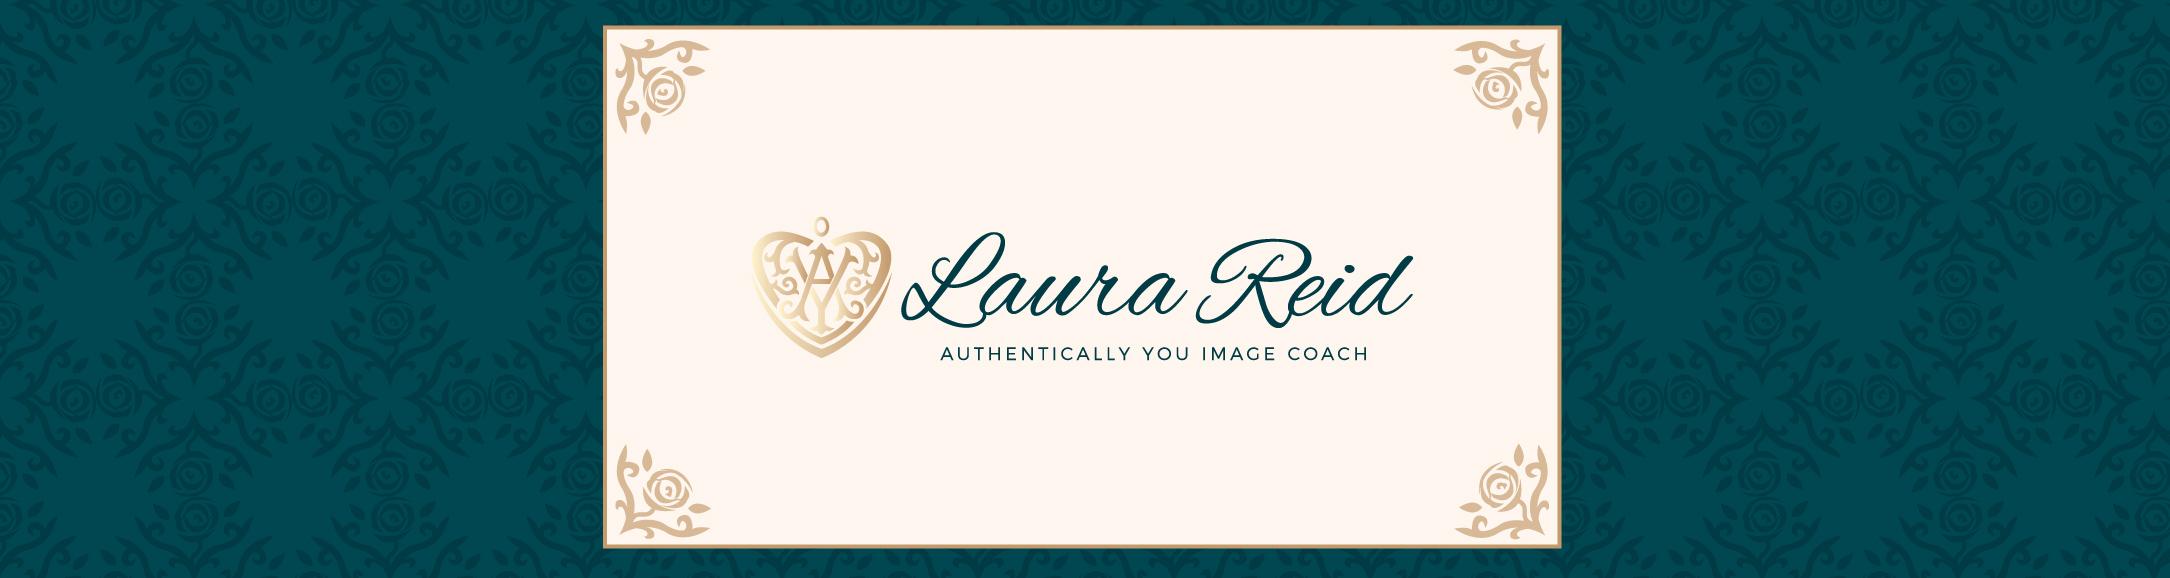 Laura Reid Branding by Glowbug Design